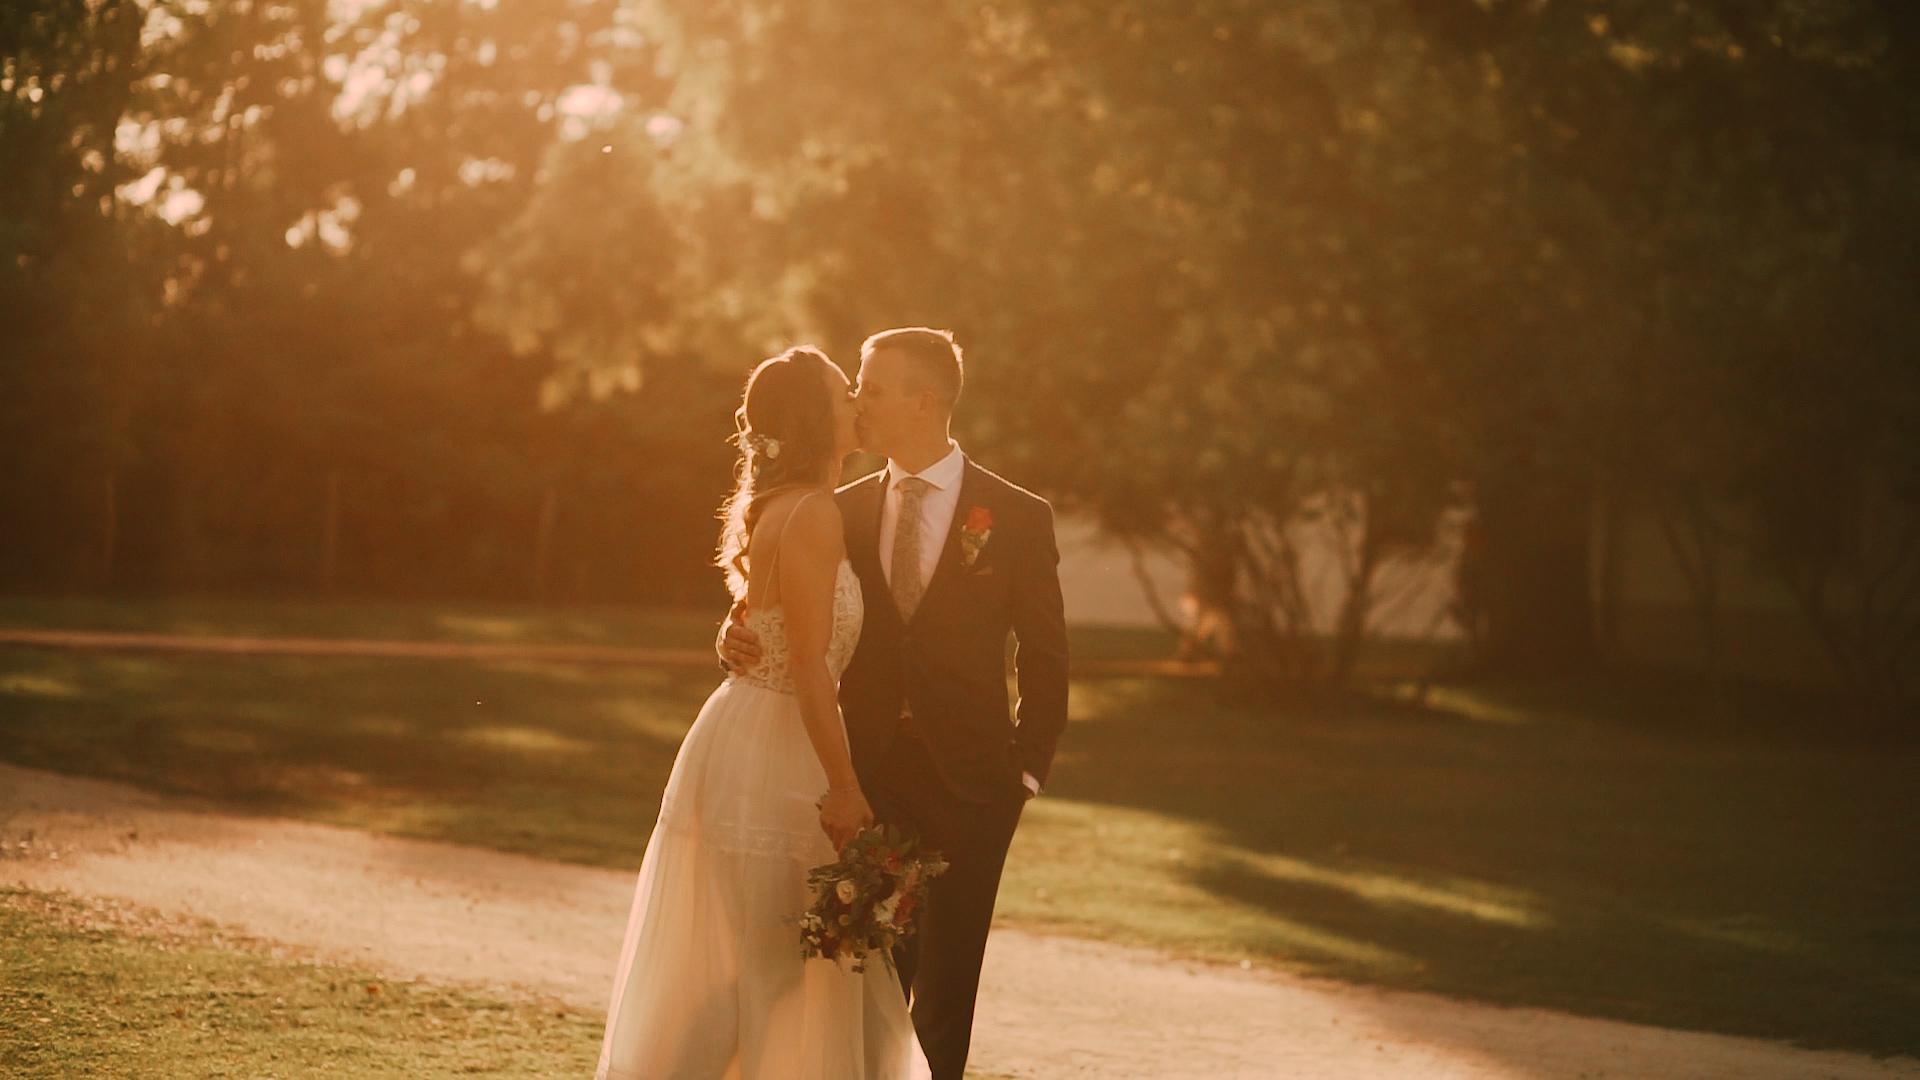 Kriszti & András – Wedding Highlight Film